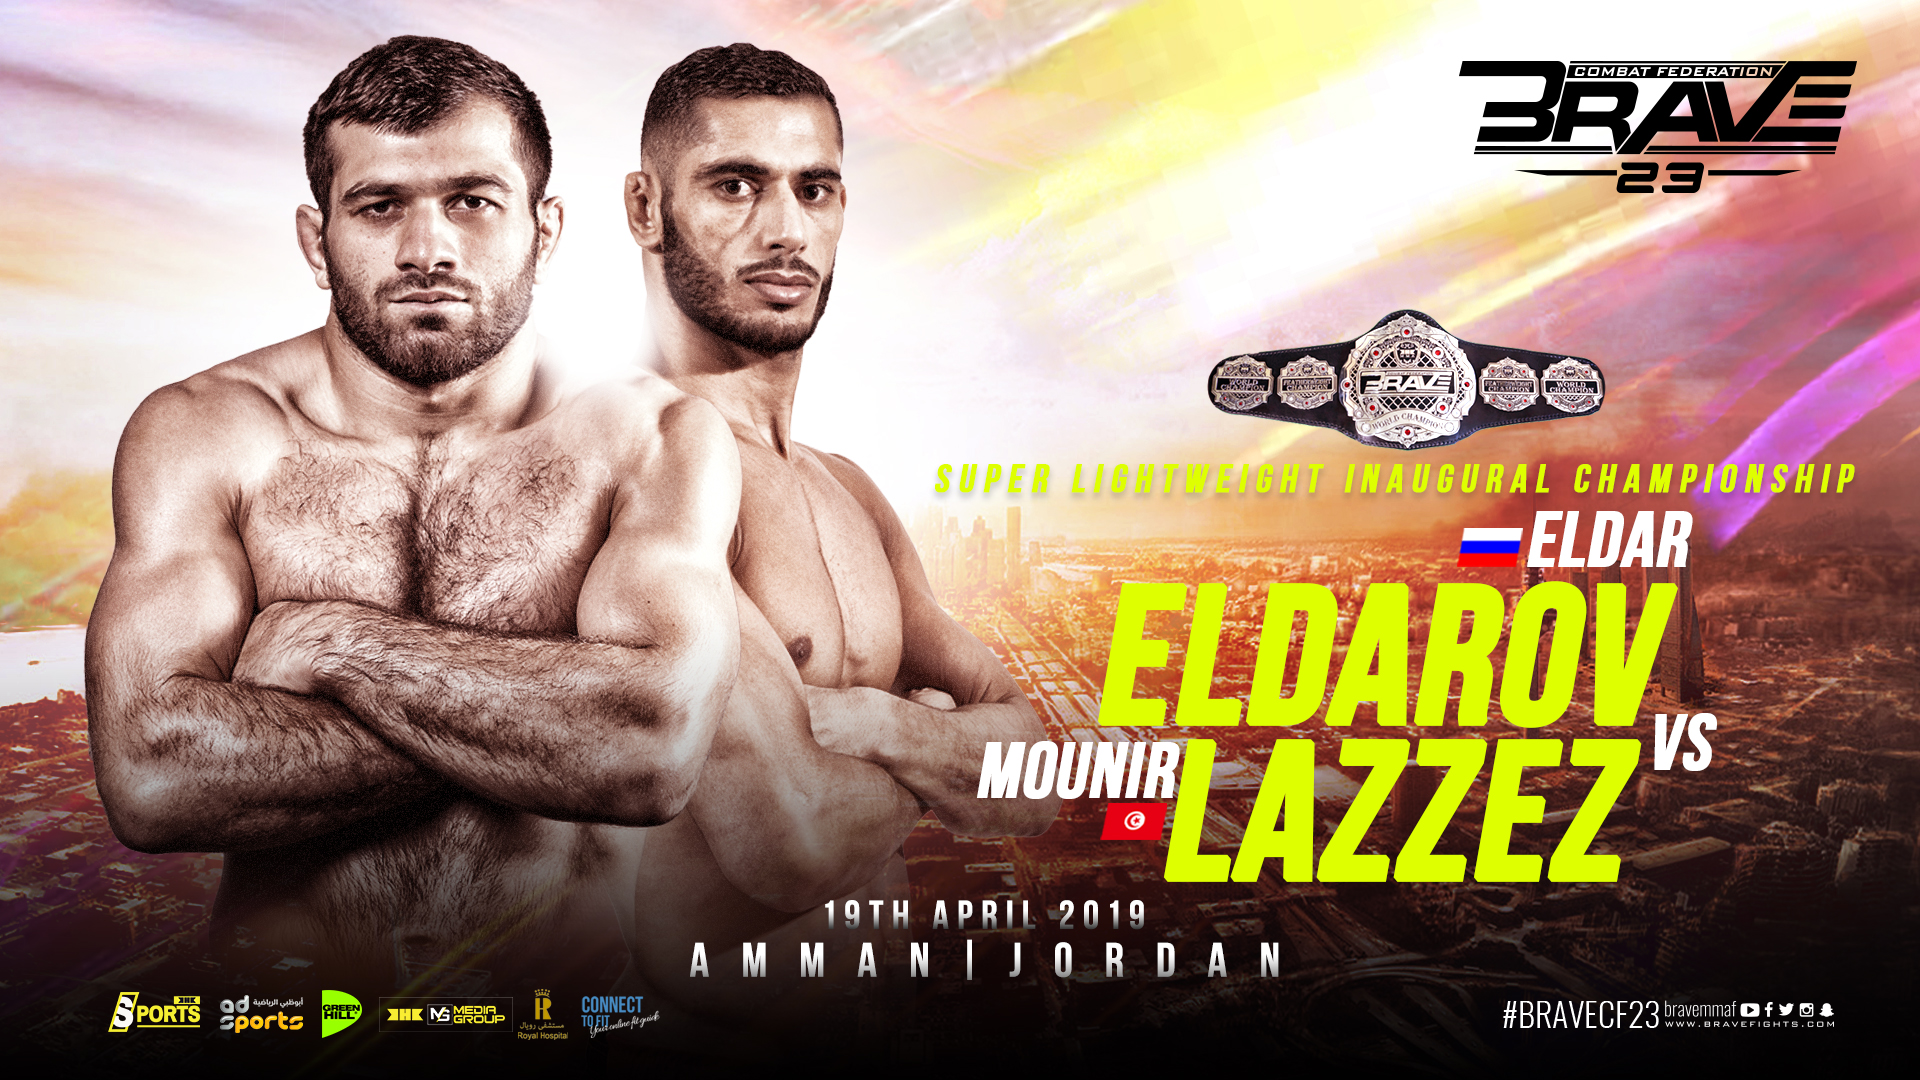 Eldar Eldarov looks to make history at Brave 23 -